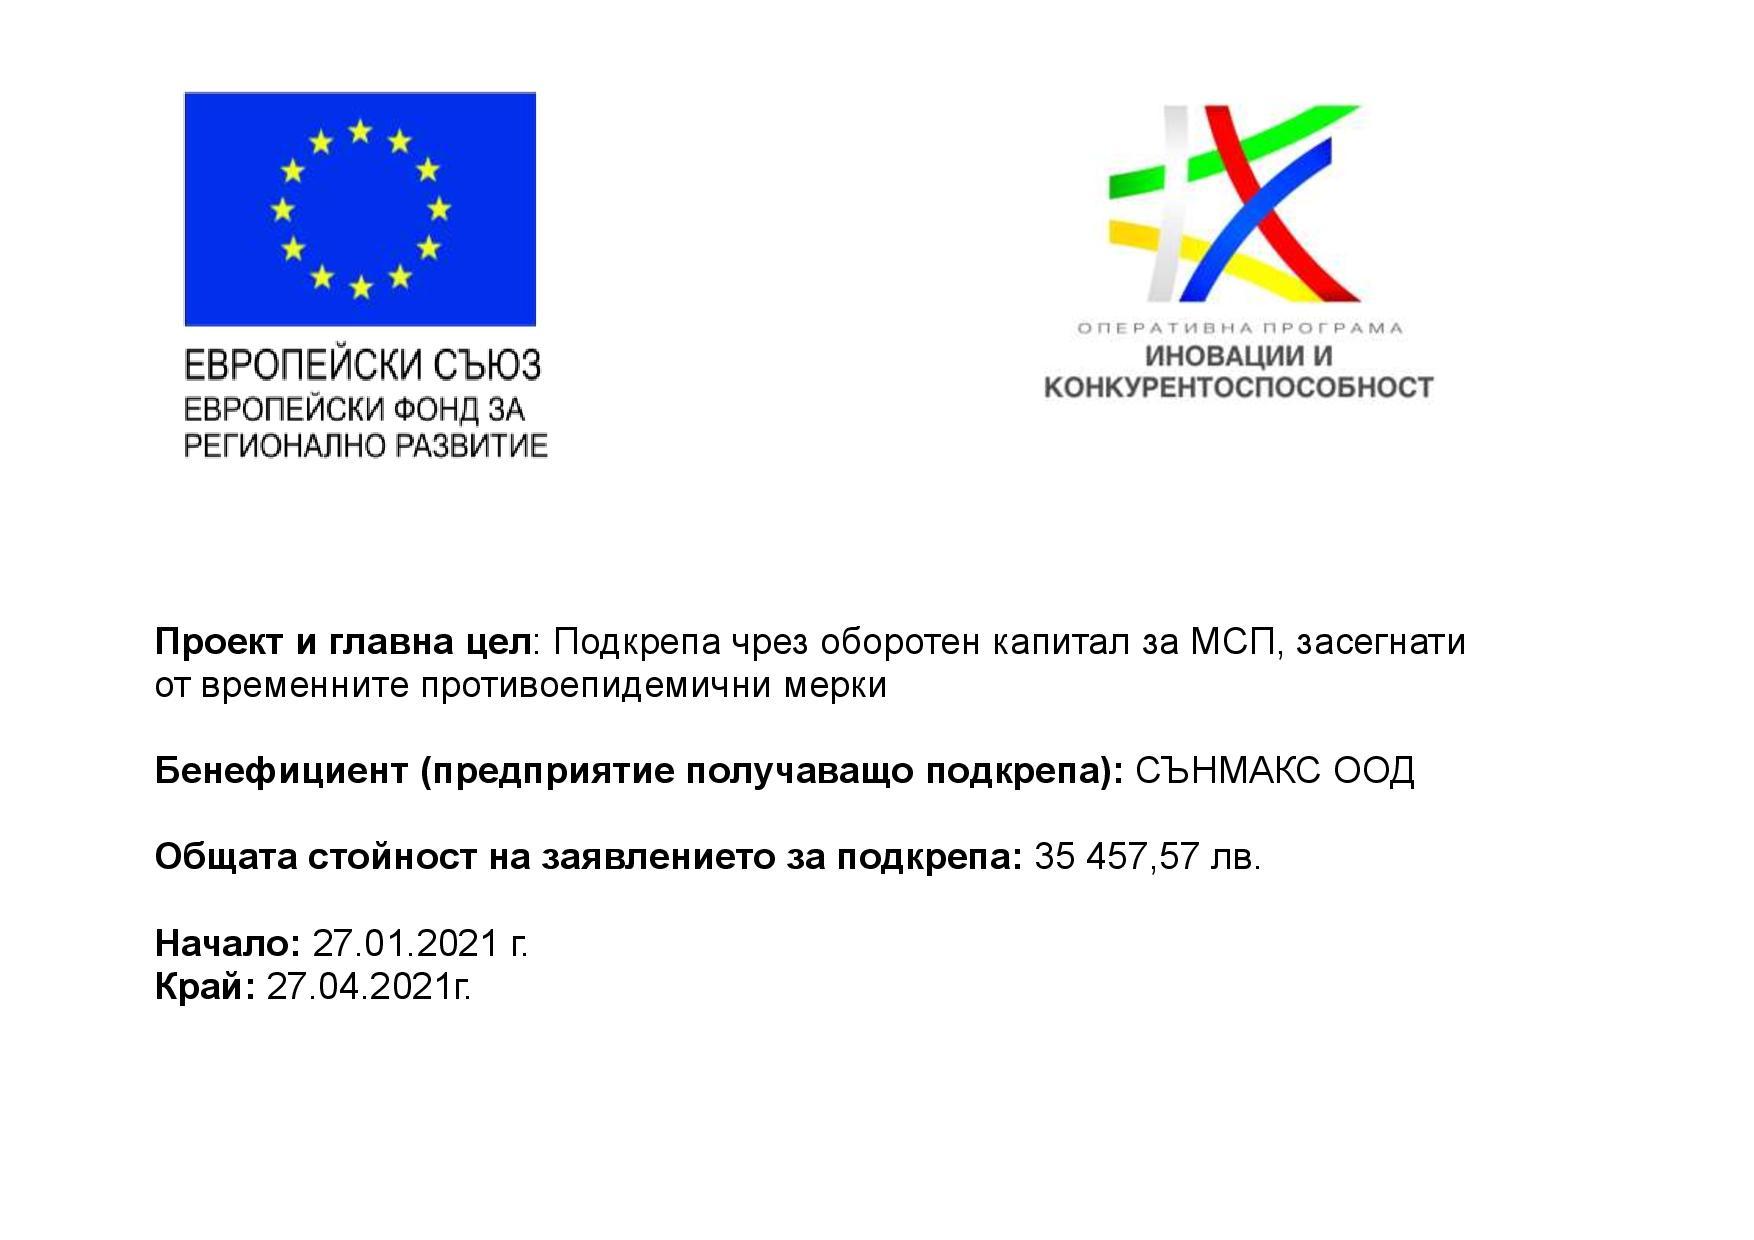 European Covid relief program